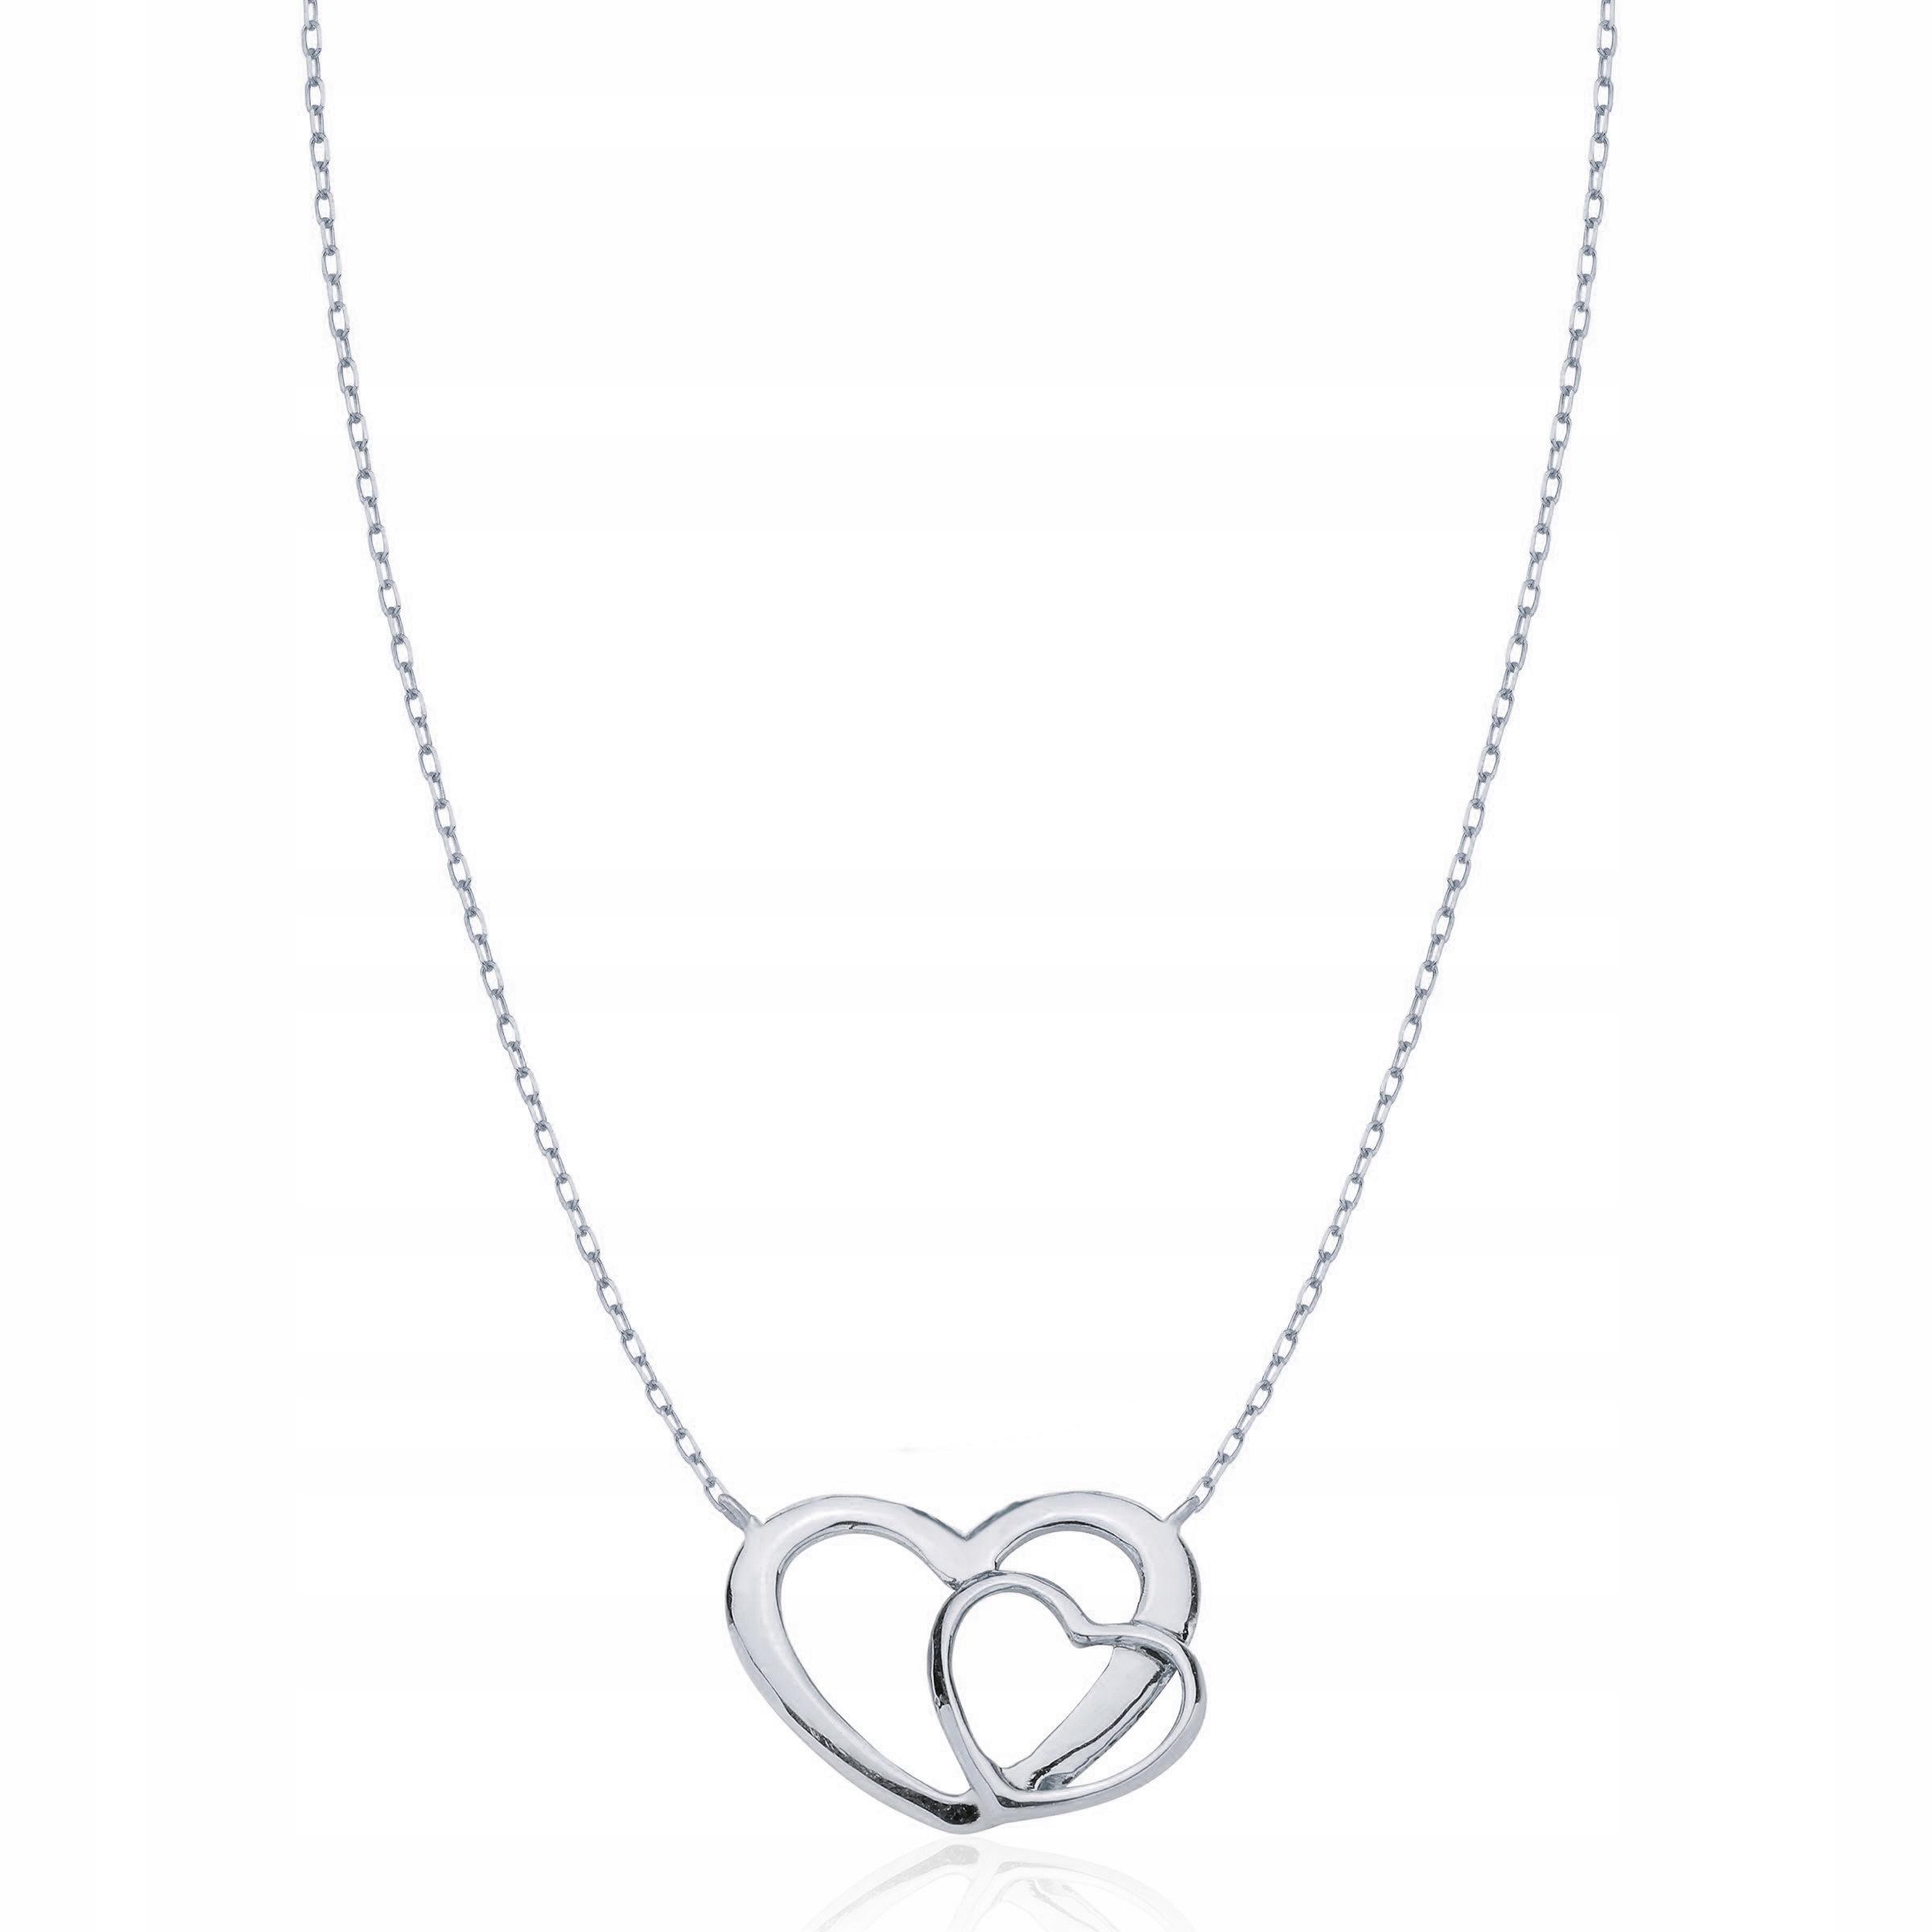 Srebrny naszyjnik 925 podwójne serce GRAWER 7981584024 XfFnlnPc